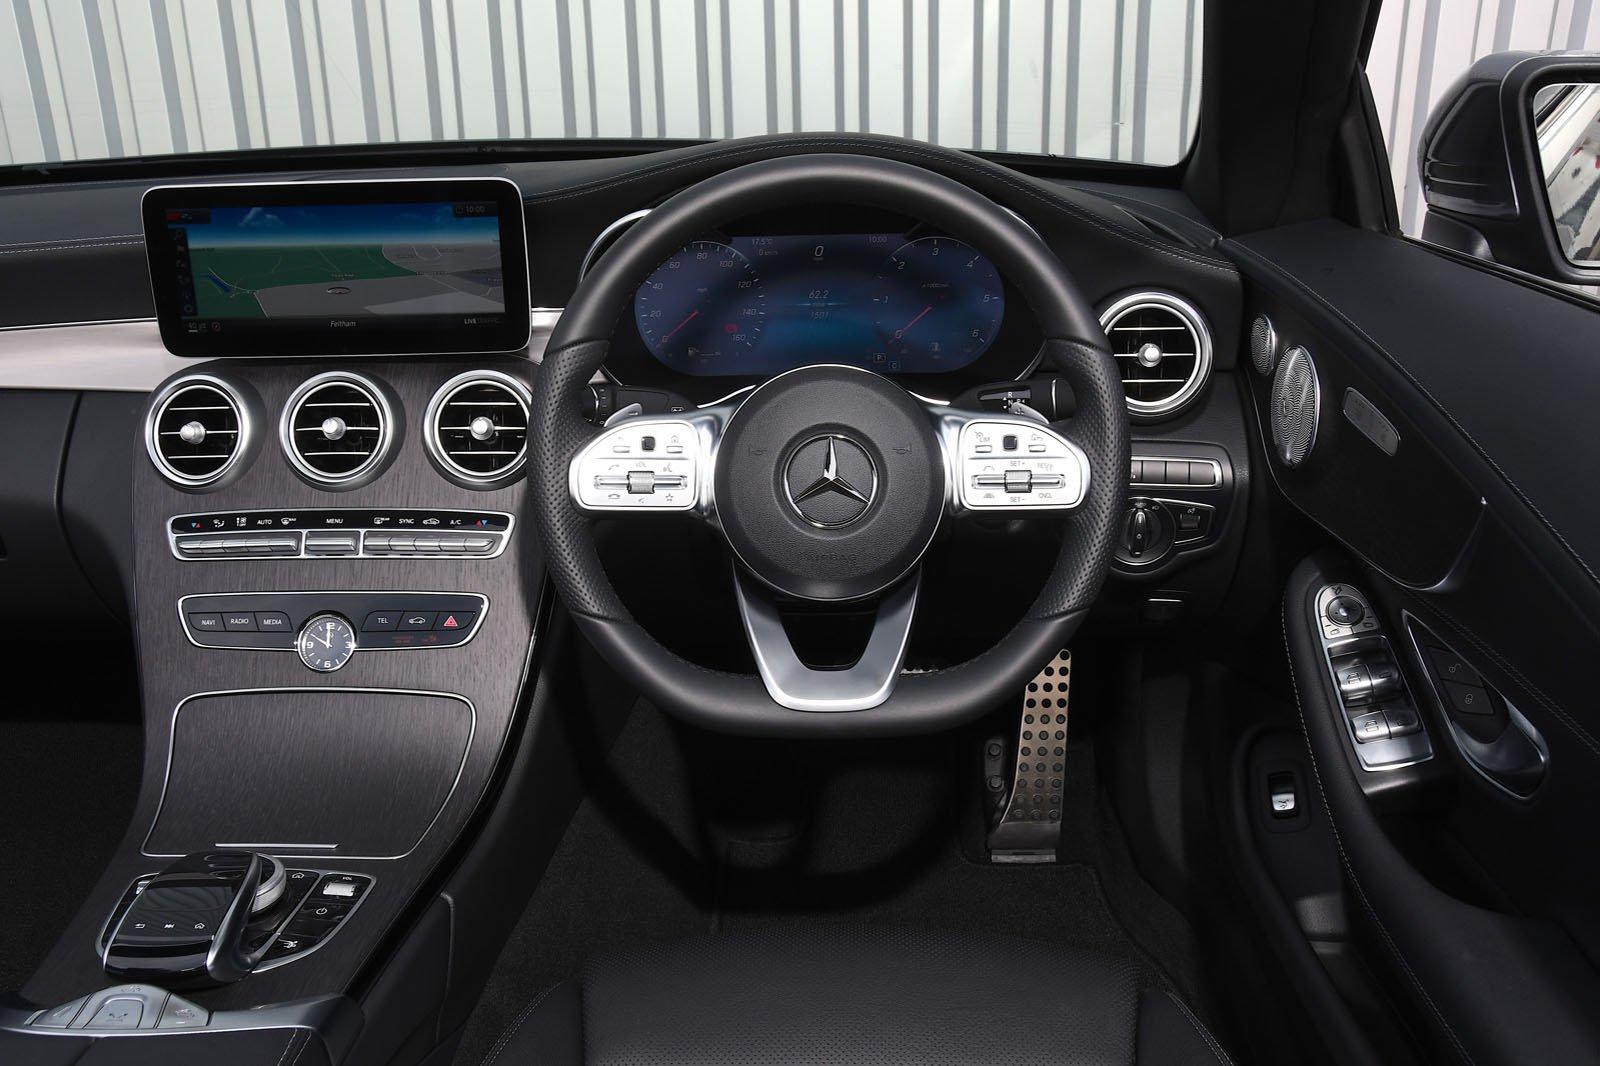 2018 Mercedes-Benz C-Class Cabriolet interior